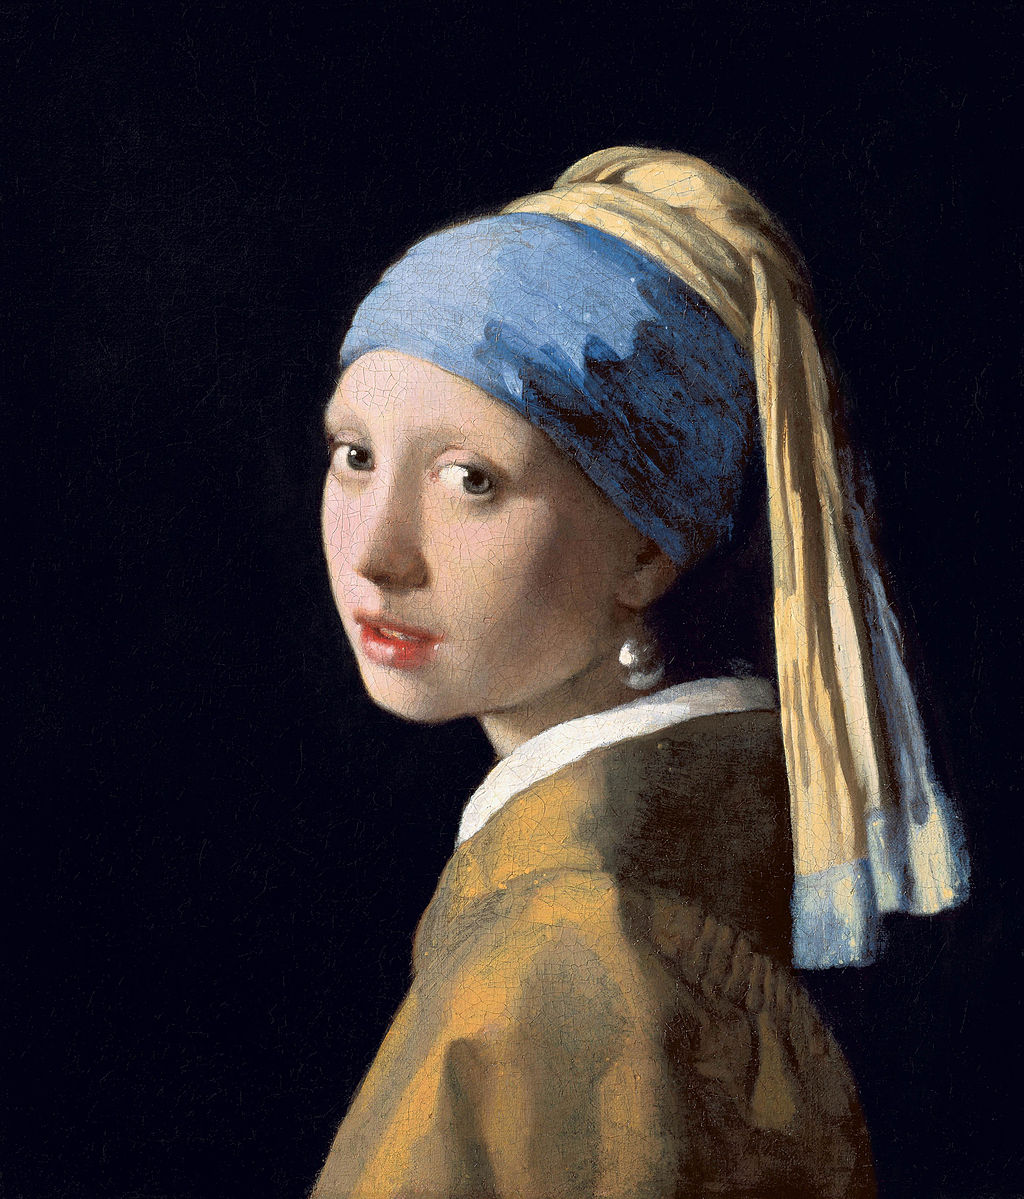 Johannes Vermeer, La jeune fille à la perle (1665)